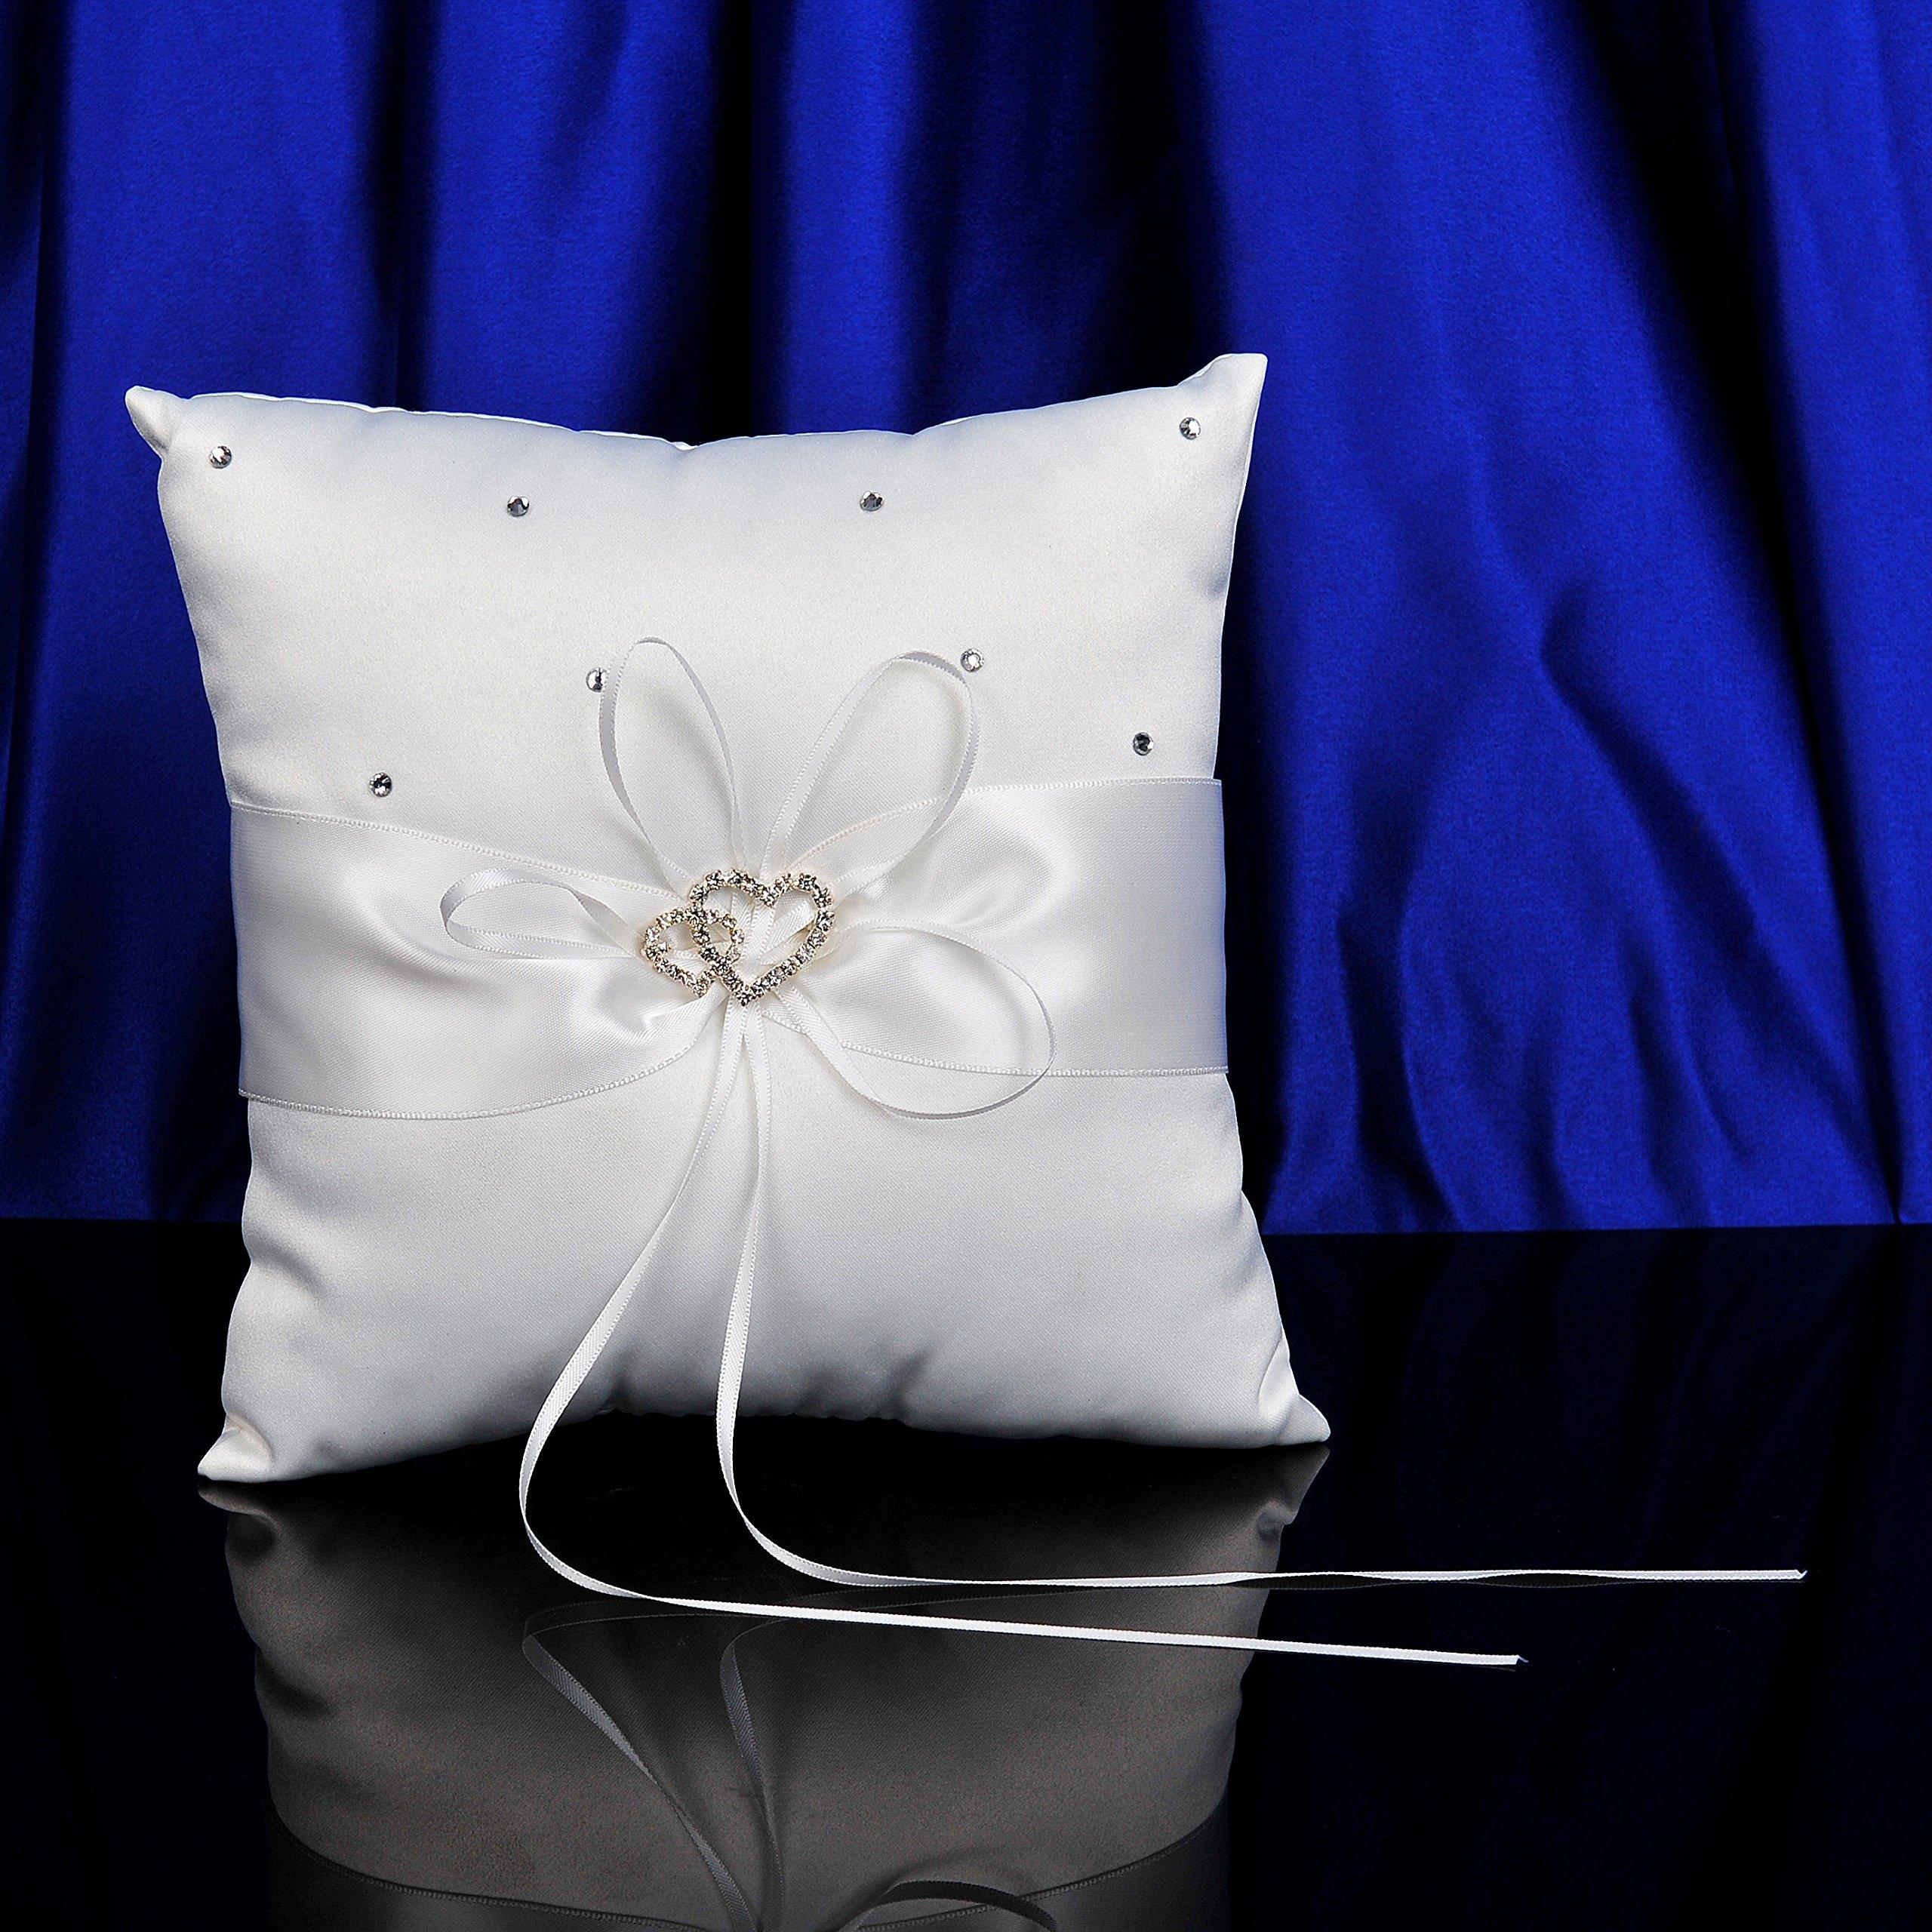 AWEI Wedding Ring Bearer Pillow - Ivory Satin Cushion Bearer 7.5 Inch with Double Hearts by AWEI